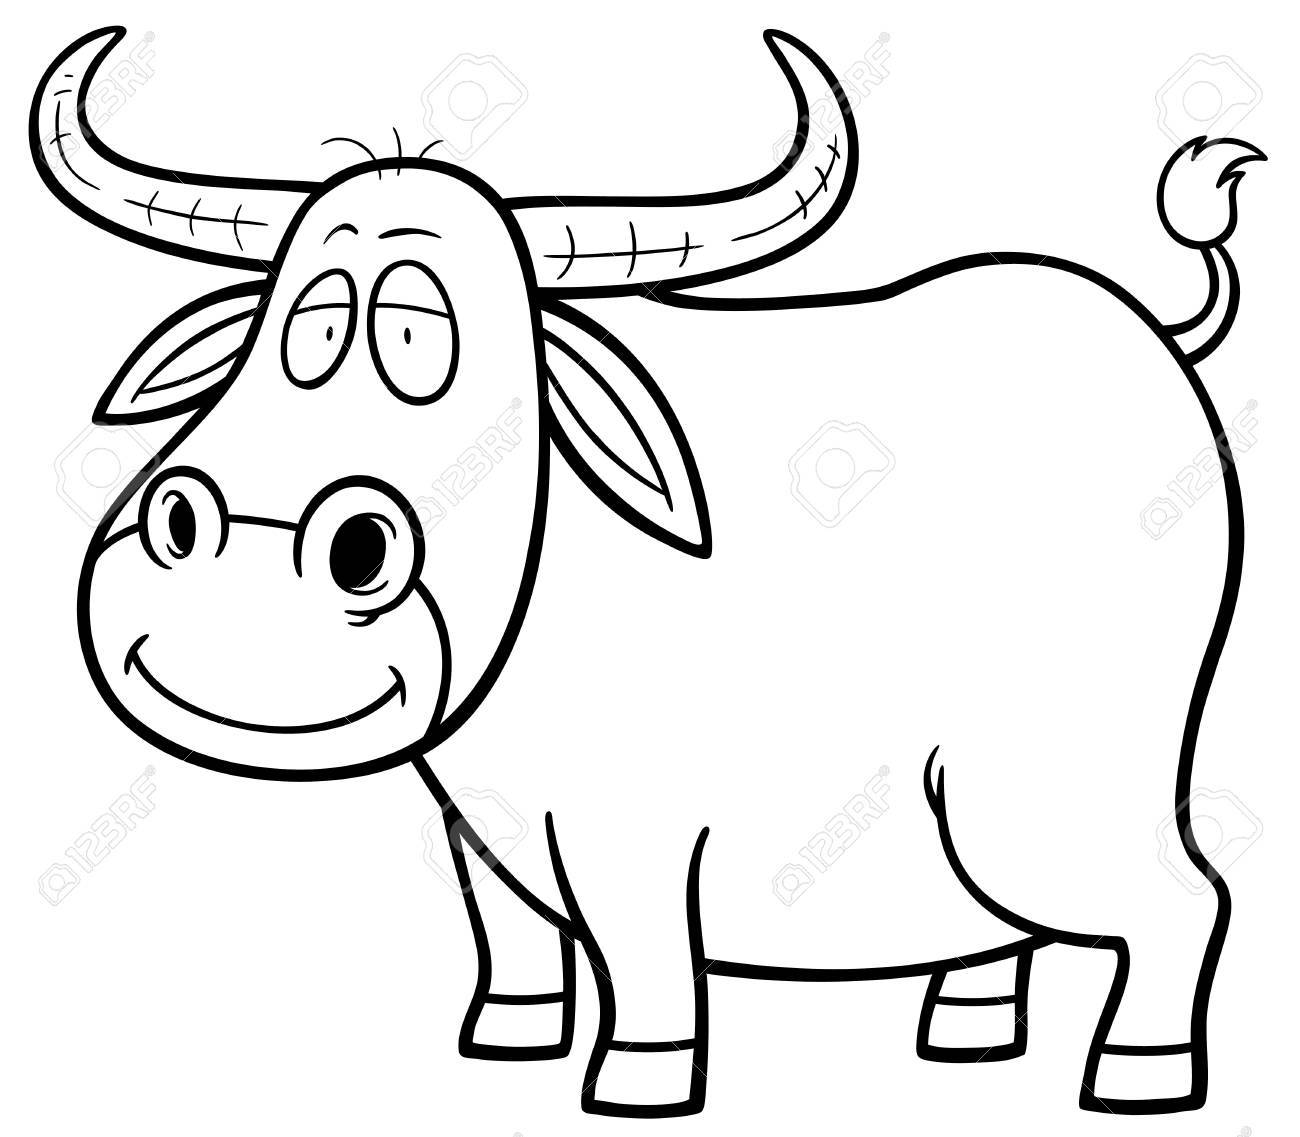 vector illustration of cartoon buffalo coloring book royalty free